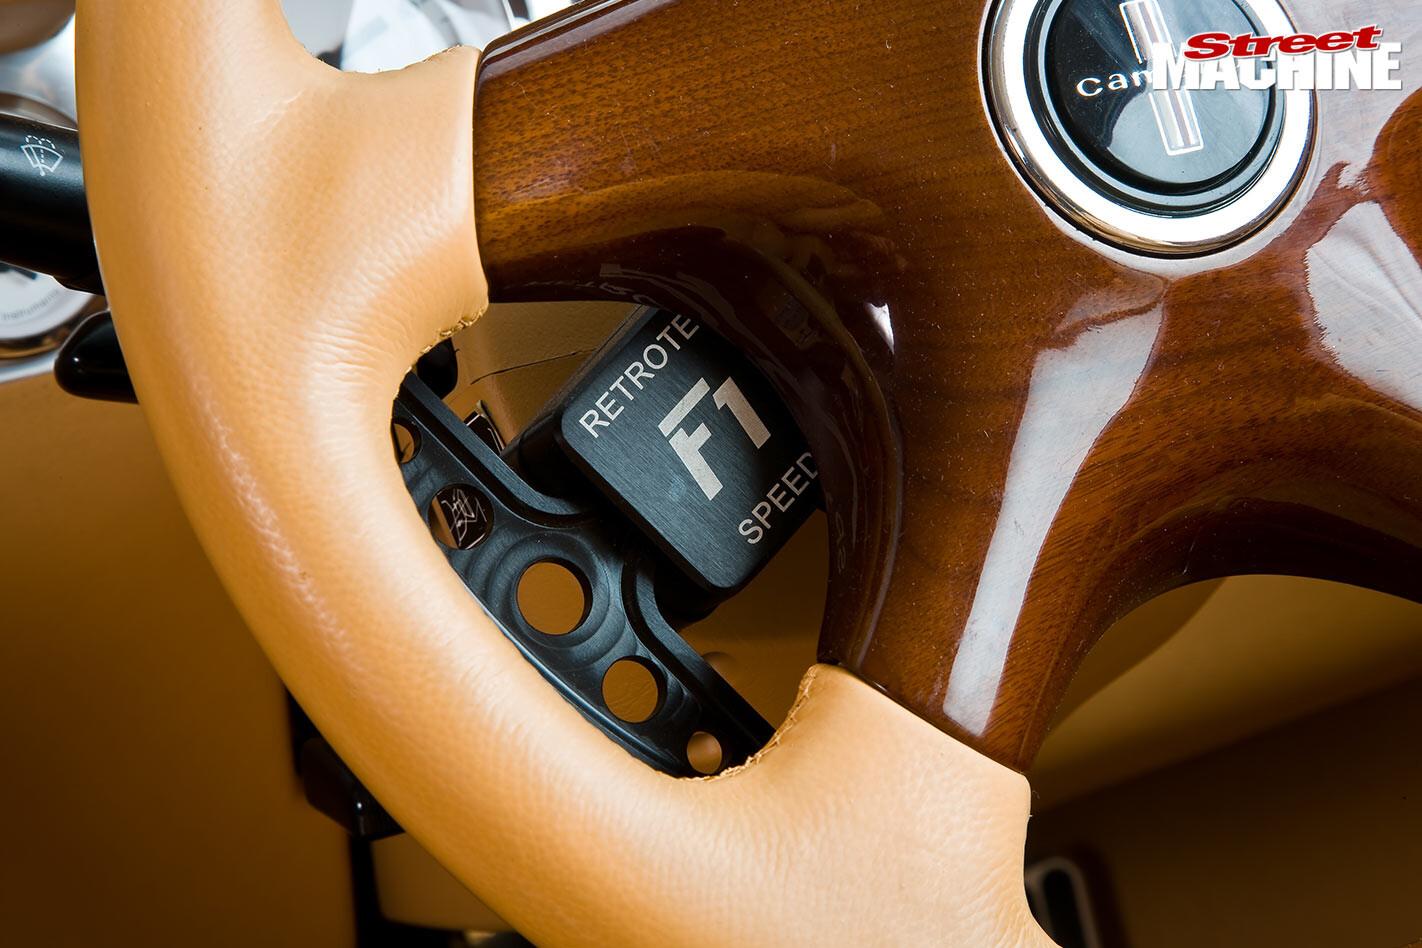 Chev Camaro wheel